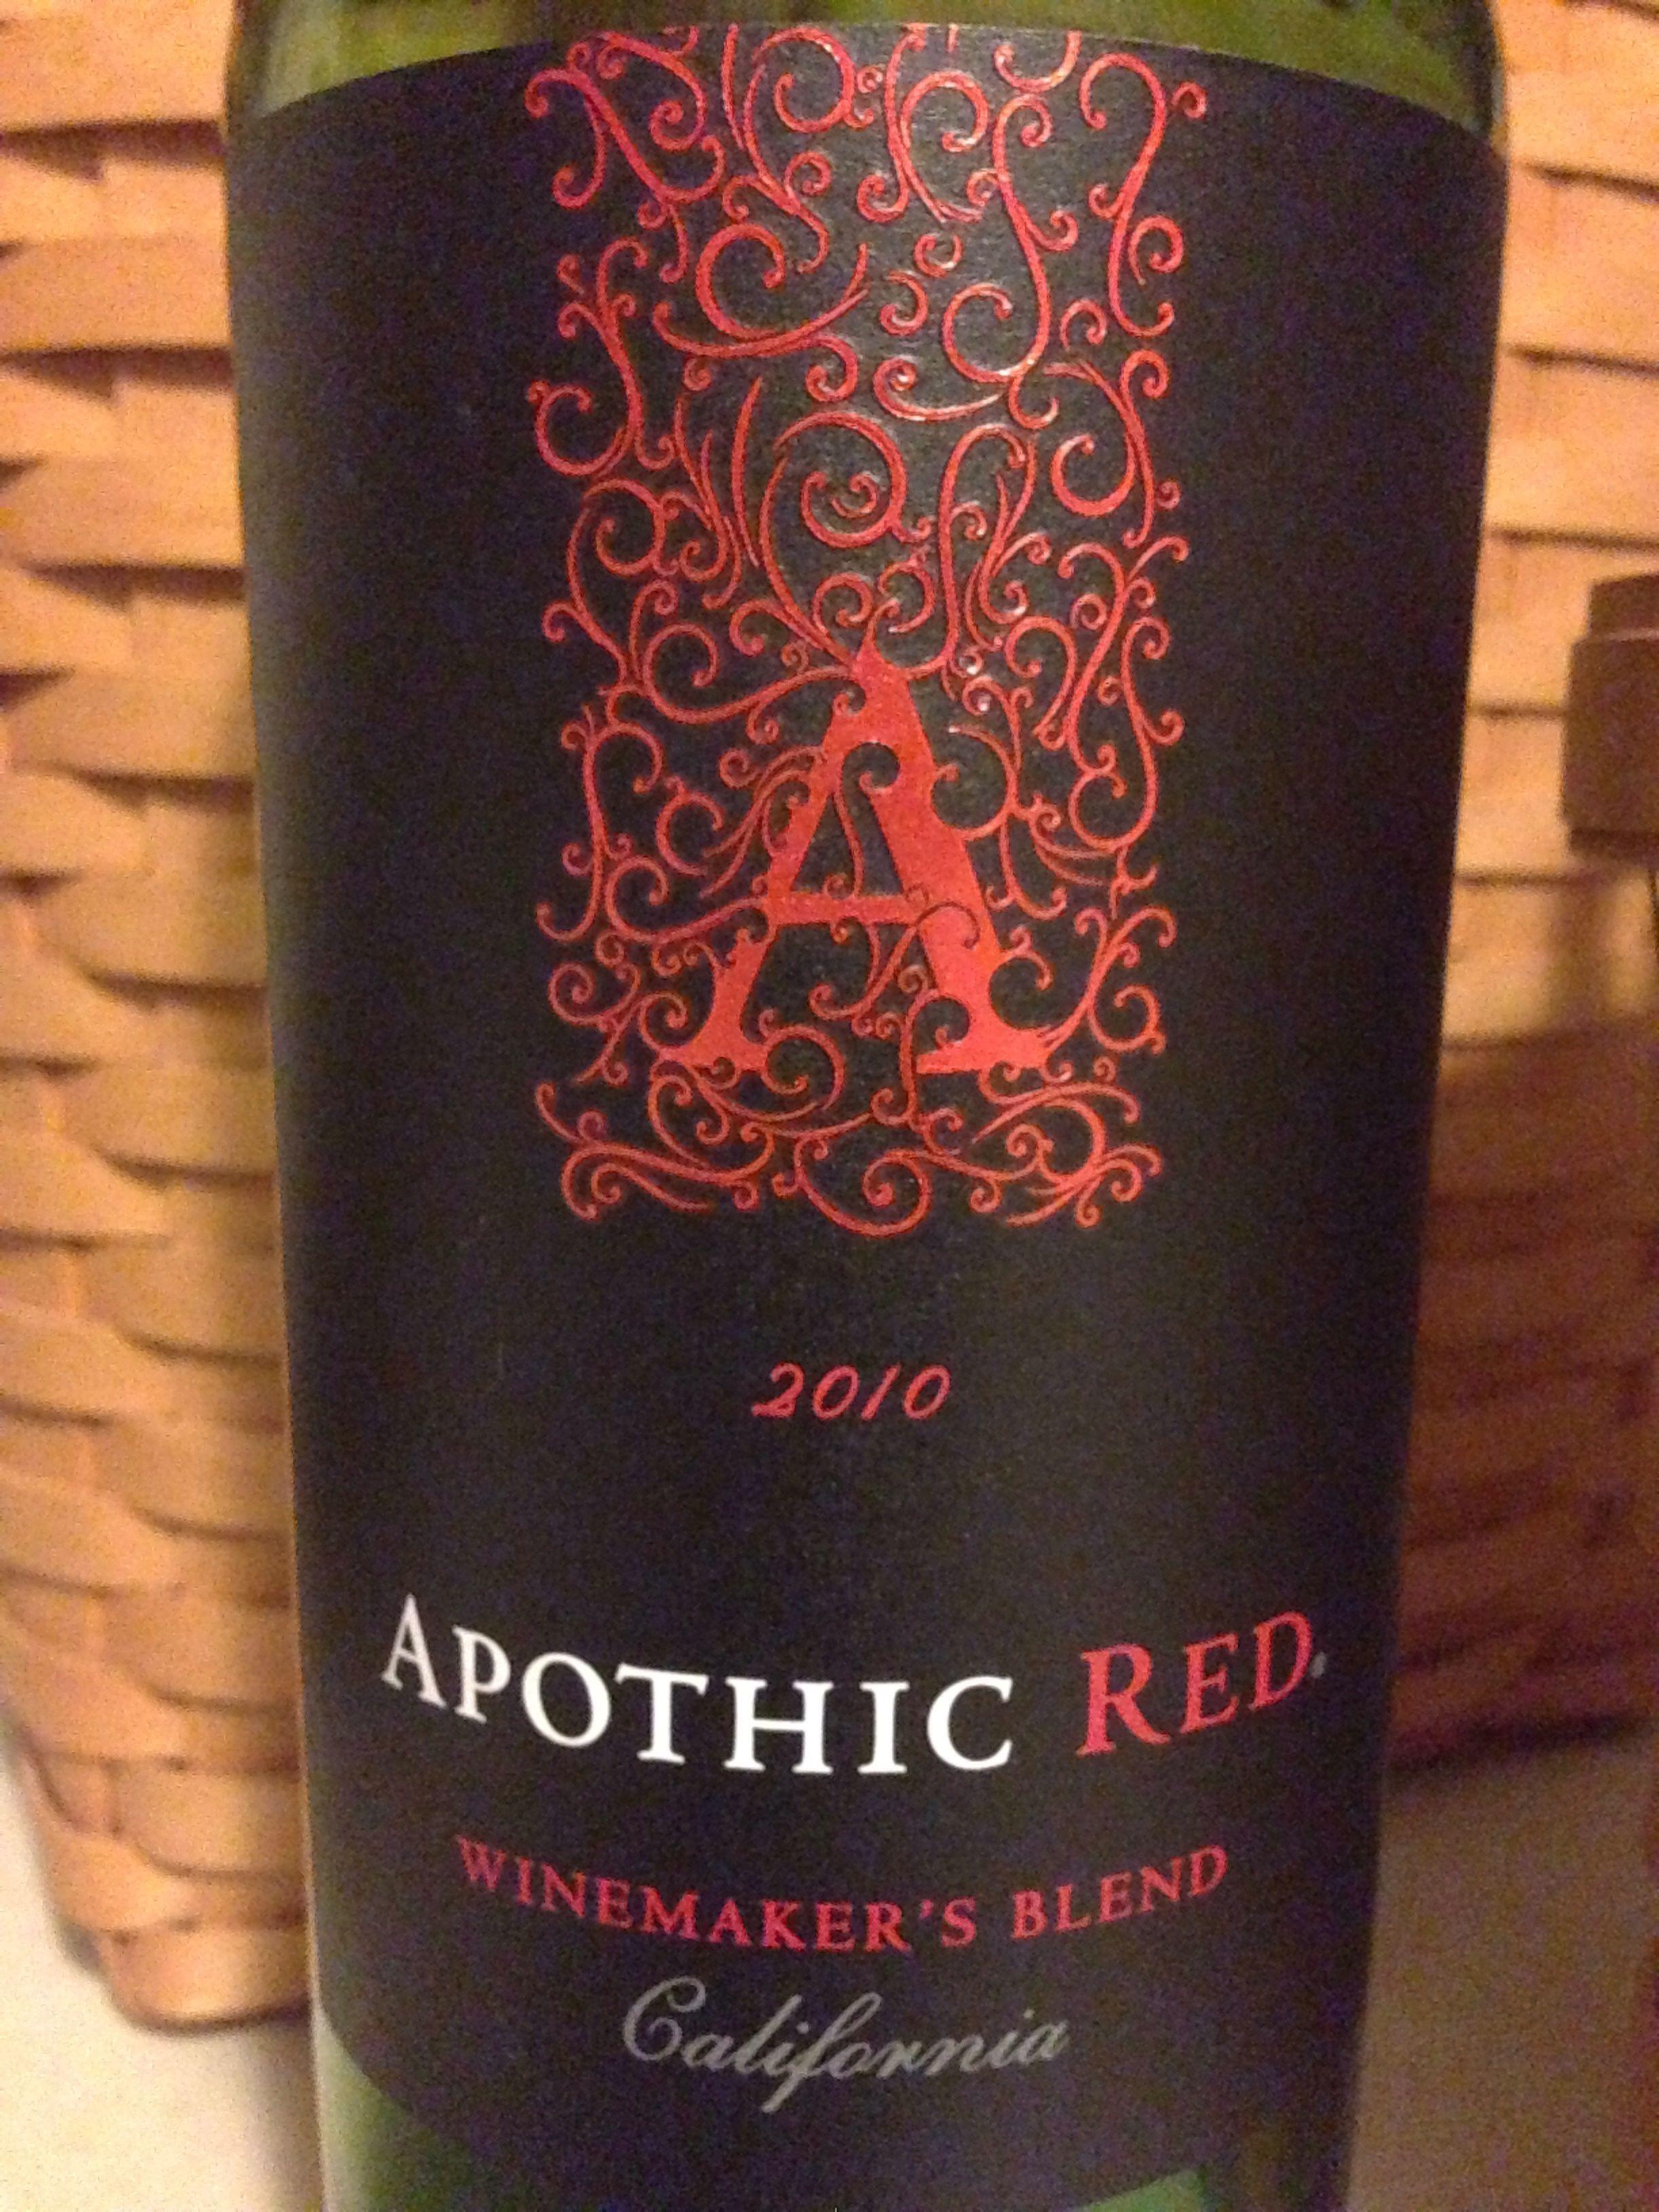 Apothic Red Good Pinot Noir Cheap Wine Winemaking